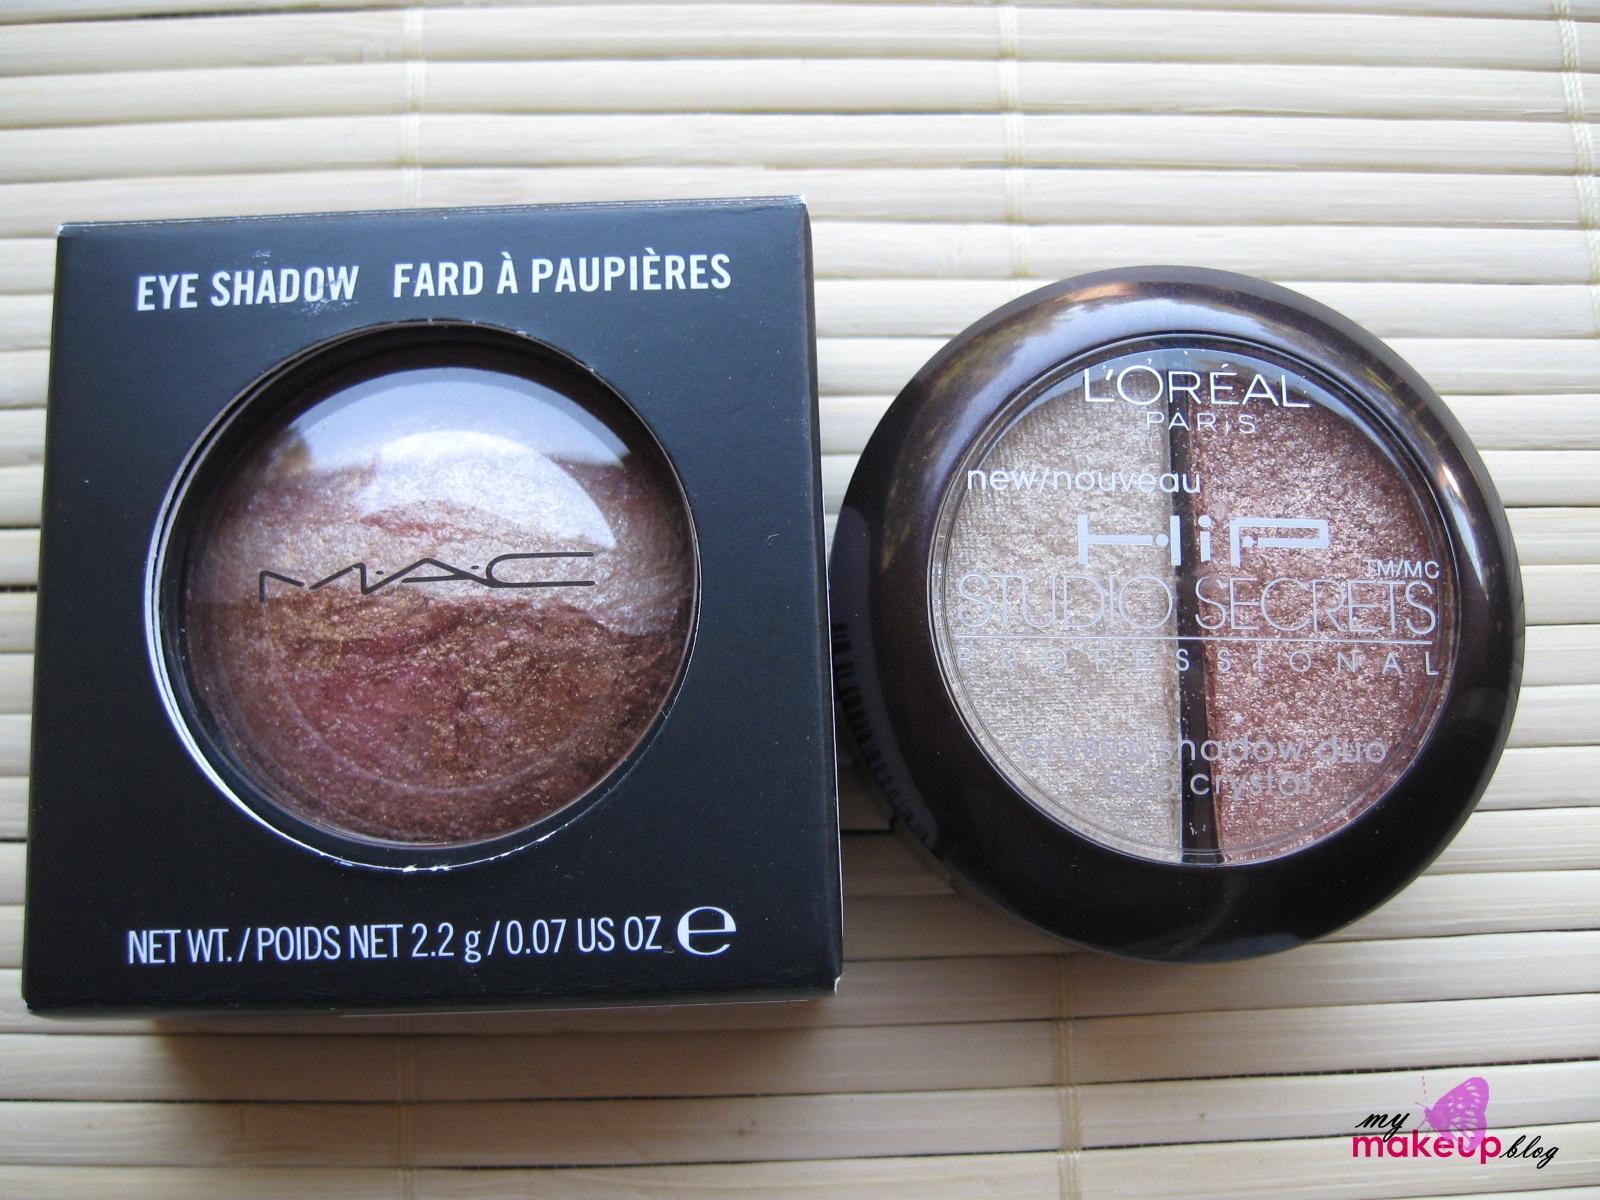 My Makeup Blog: makeup, skin care and beyond: Does L'Oreal HiP ...